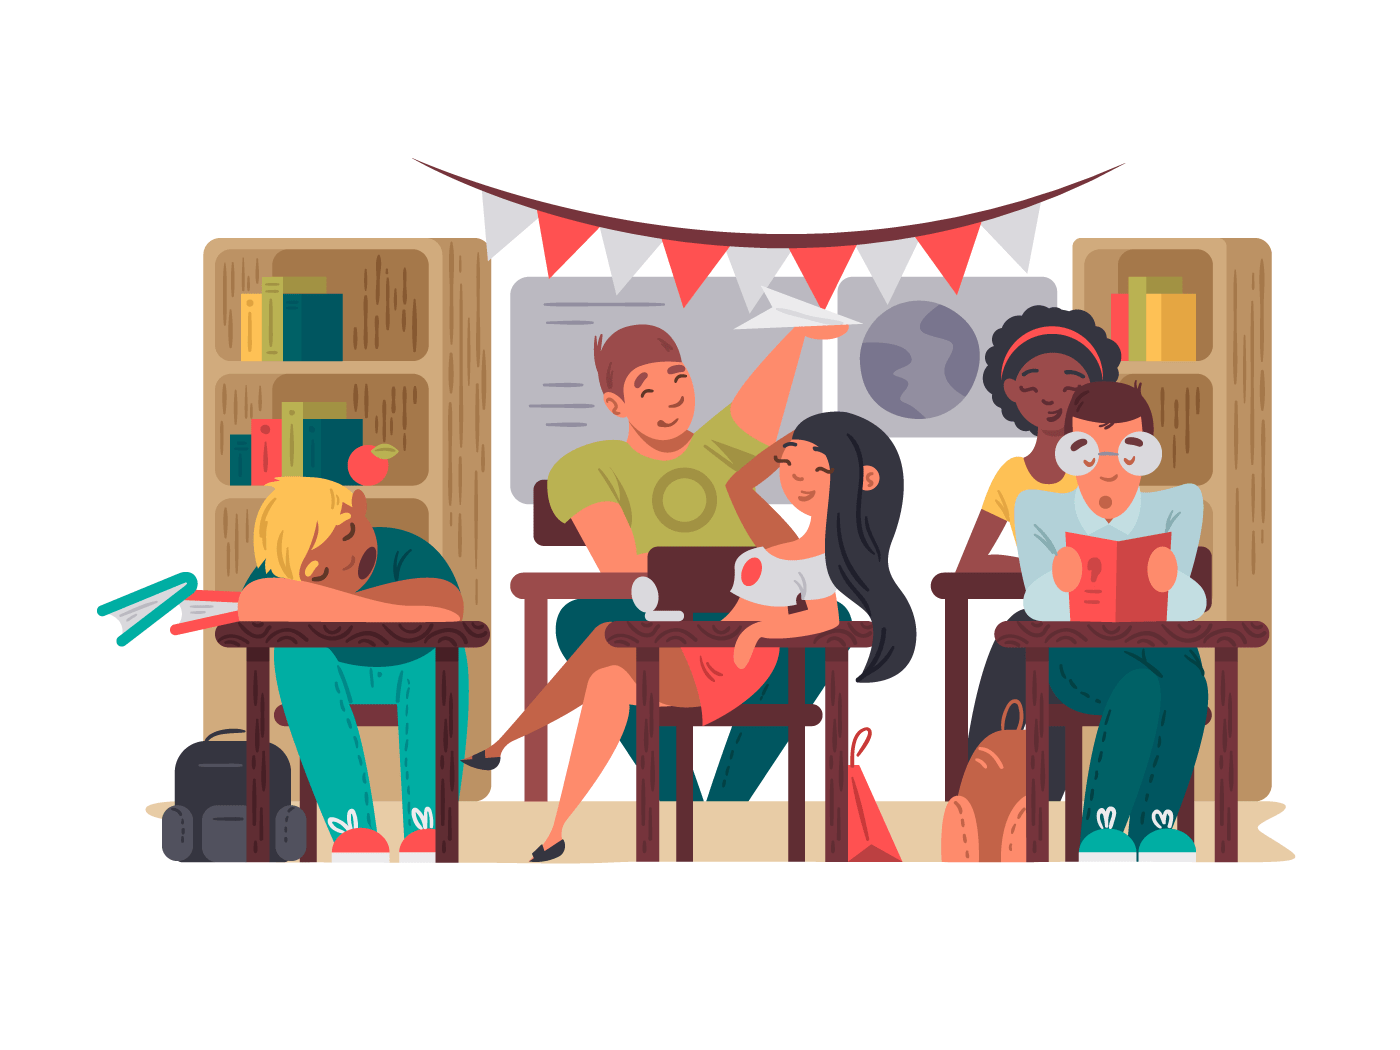 Pupils sit in classroom at desks. Education in school. Vector illustration